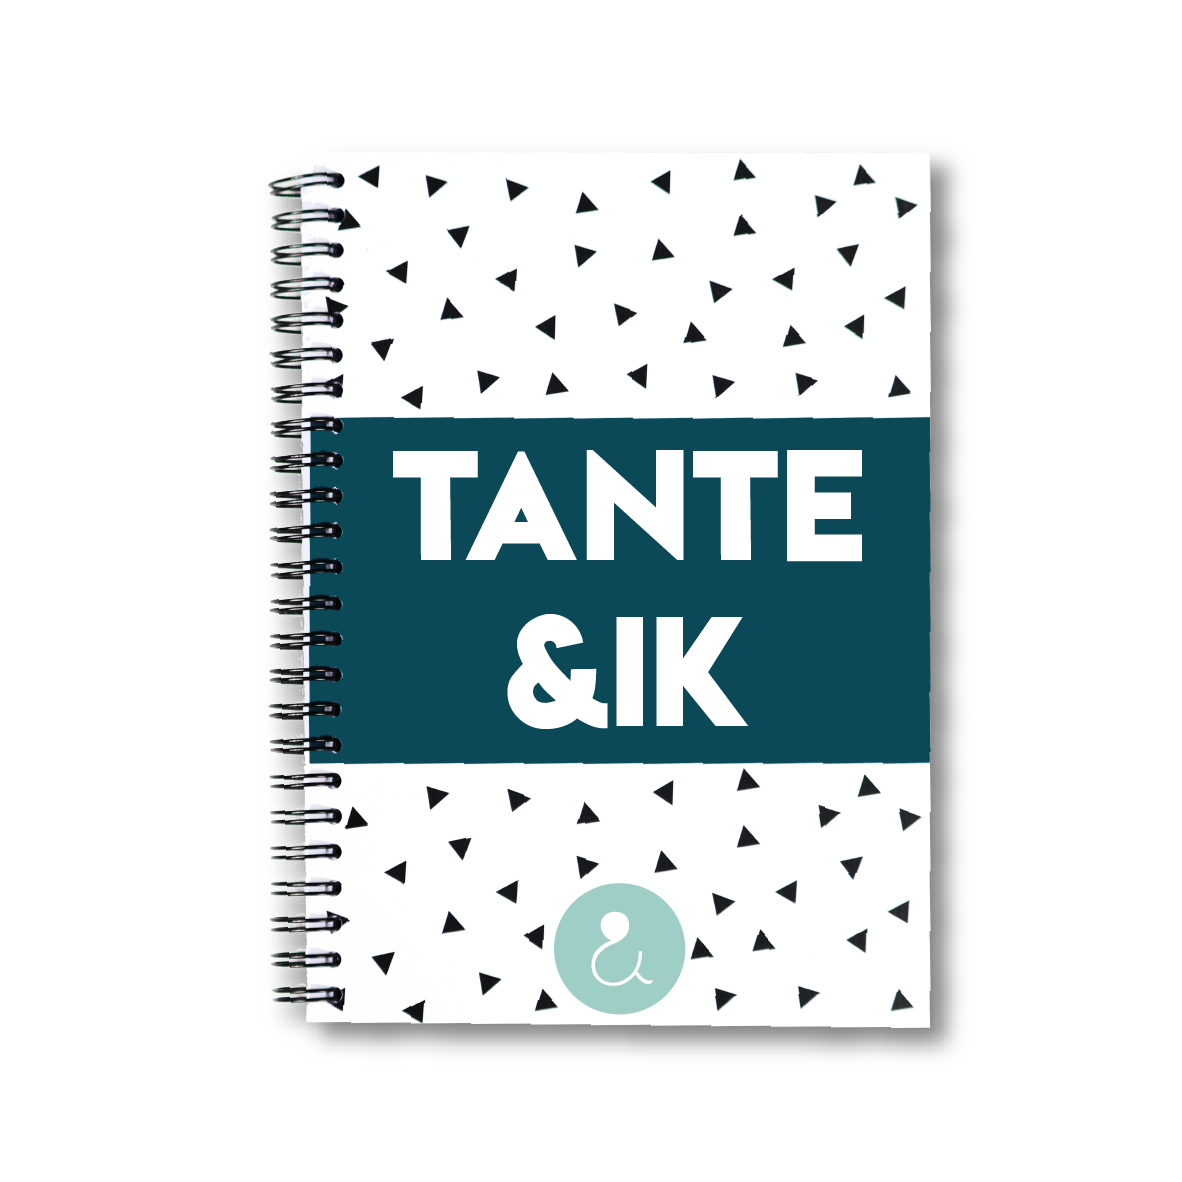 Tante&ik | invulboek voor tante (mint stip)